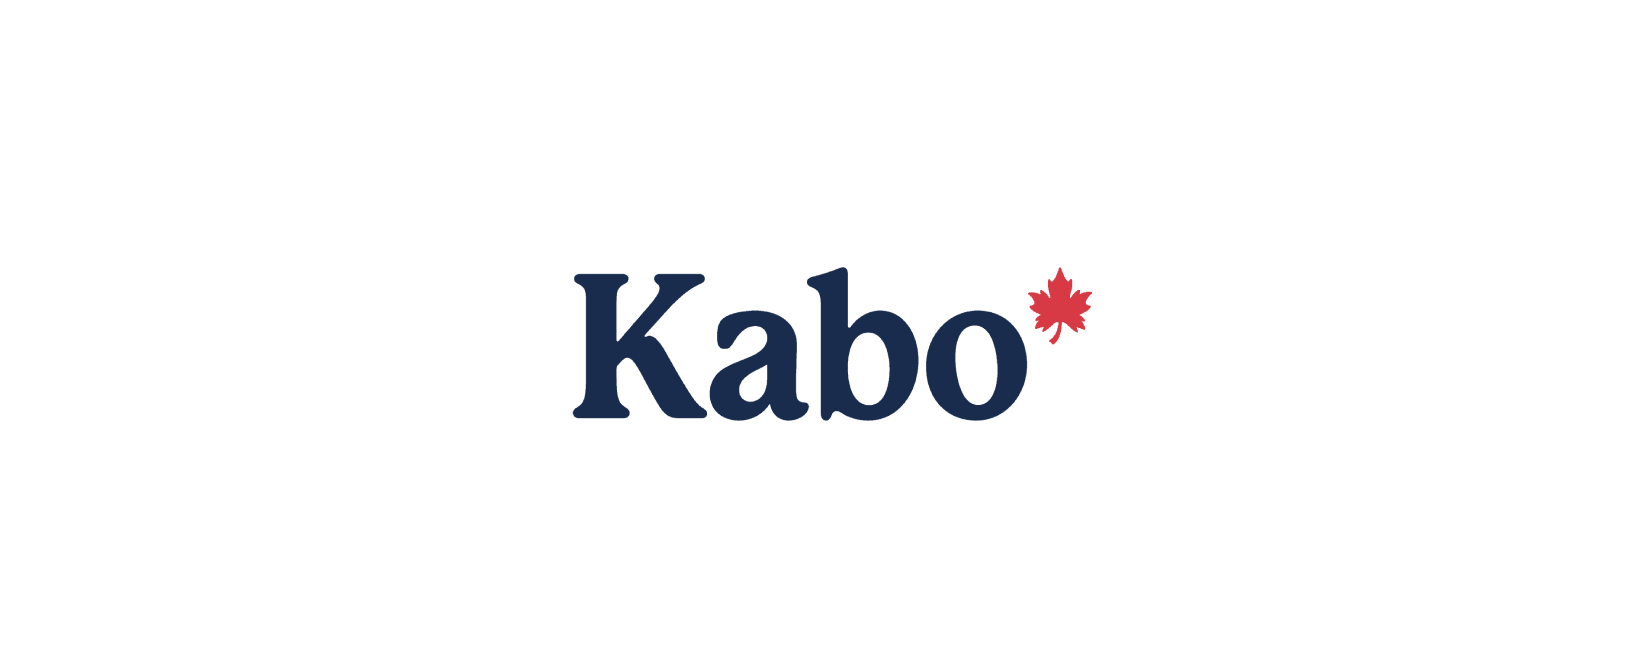 Kabo Coupon Code 2021